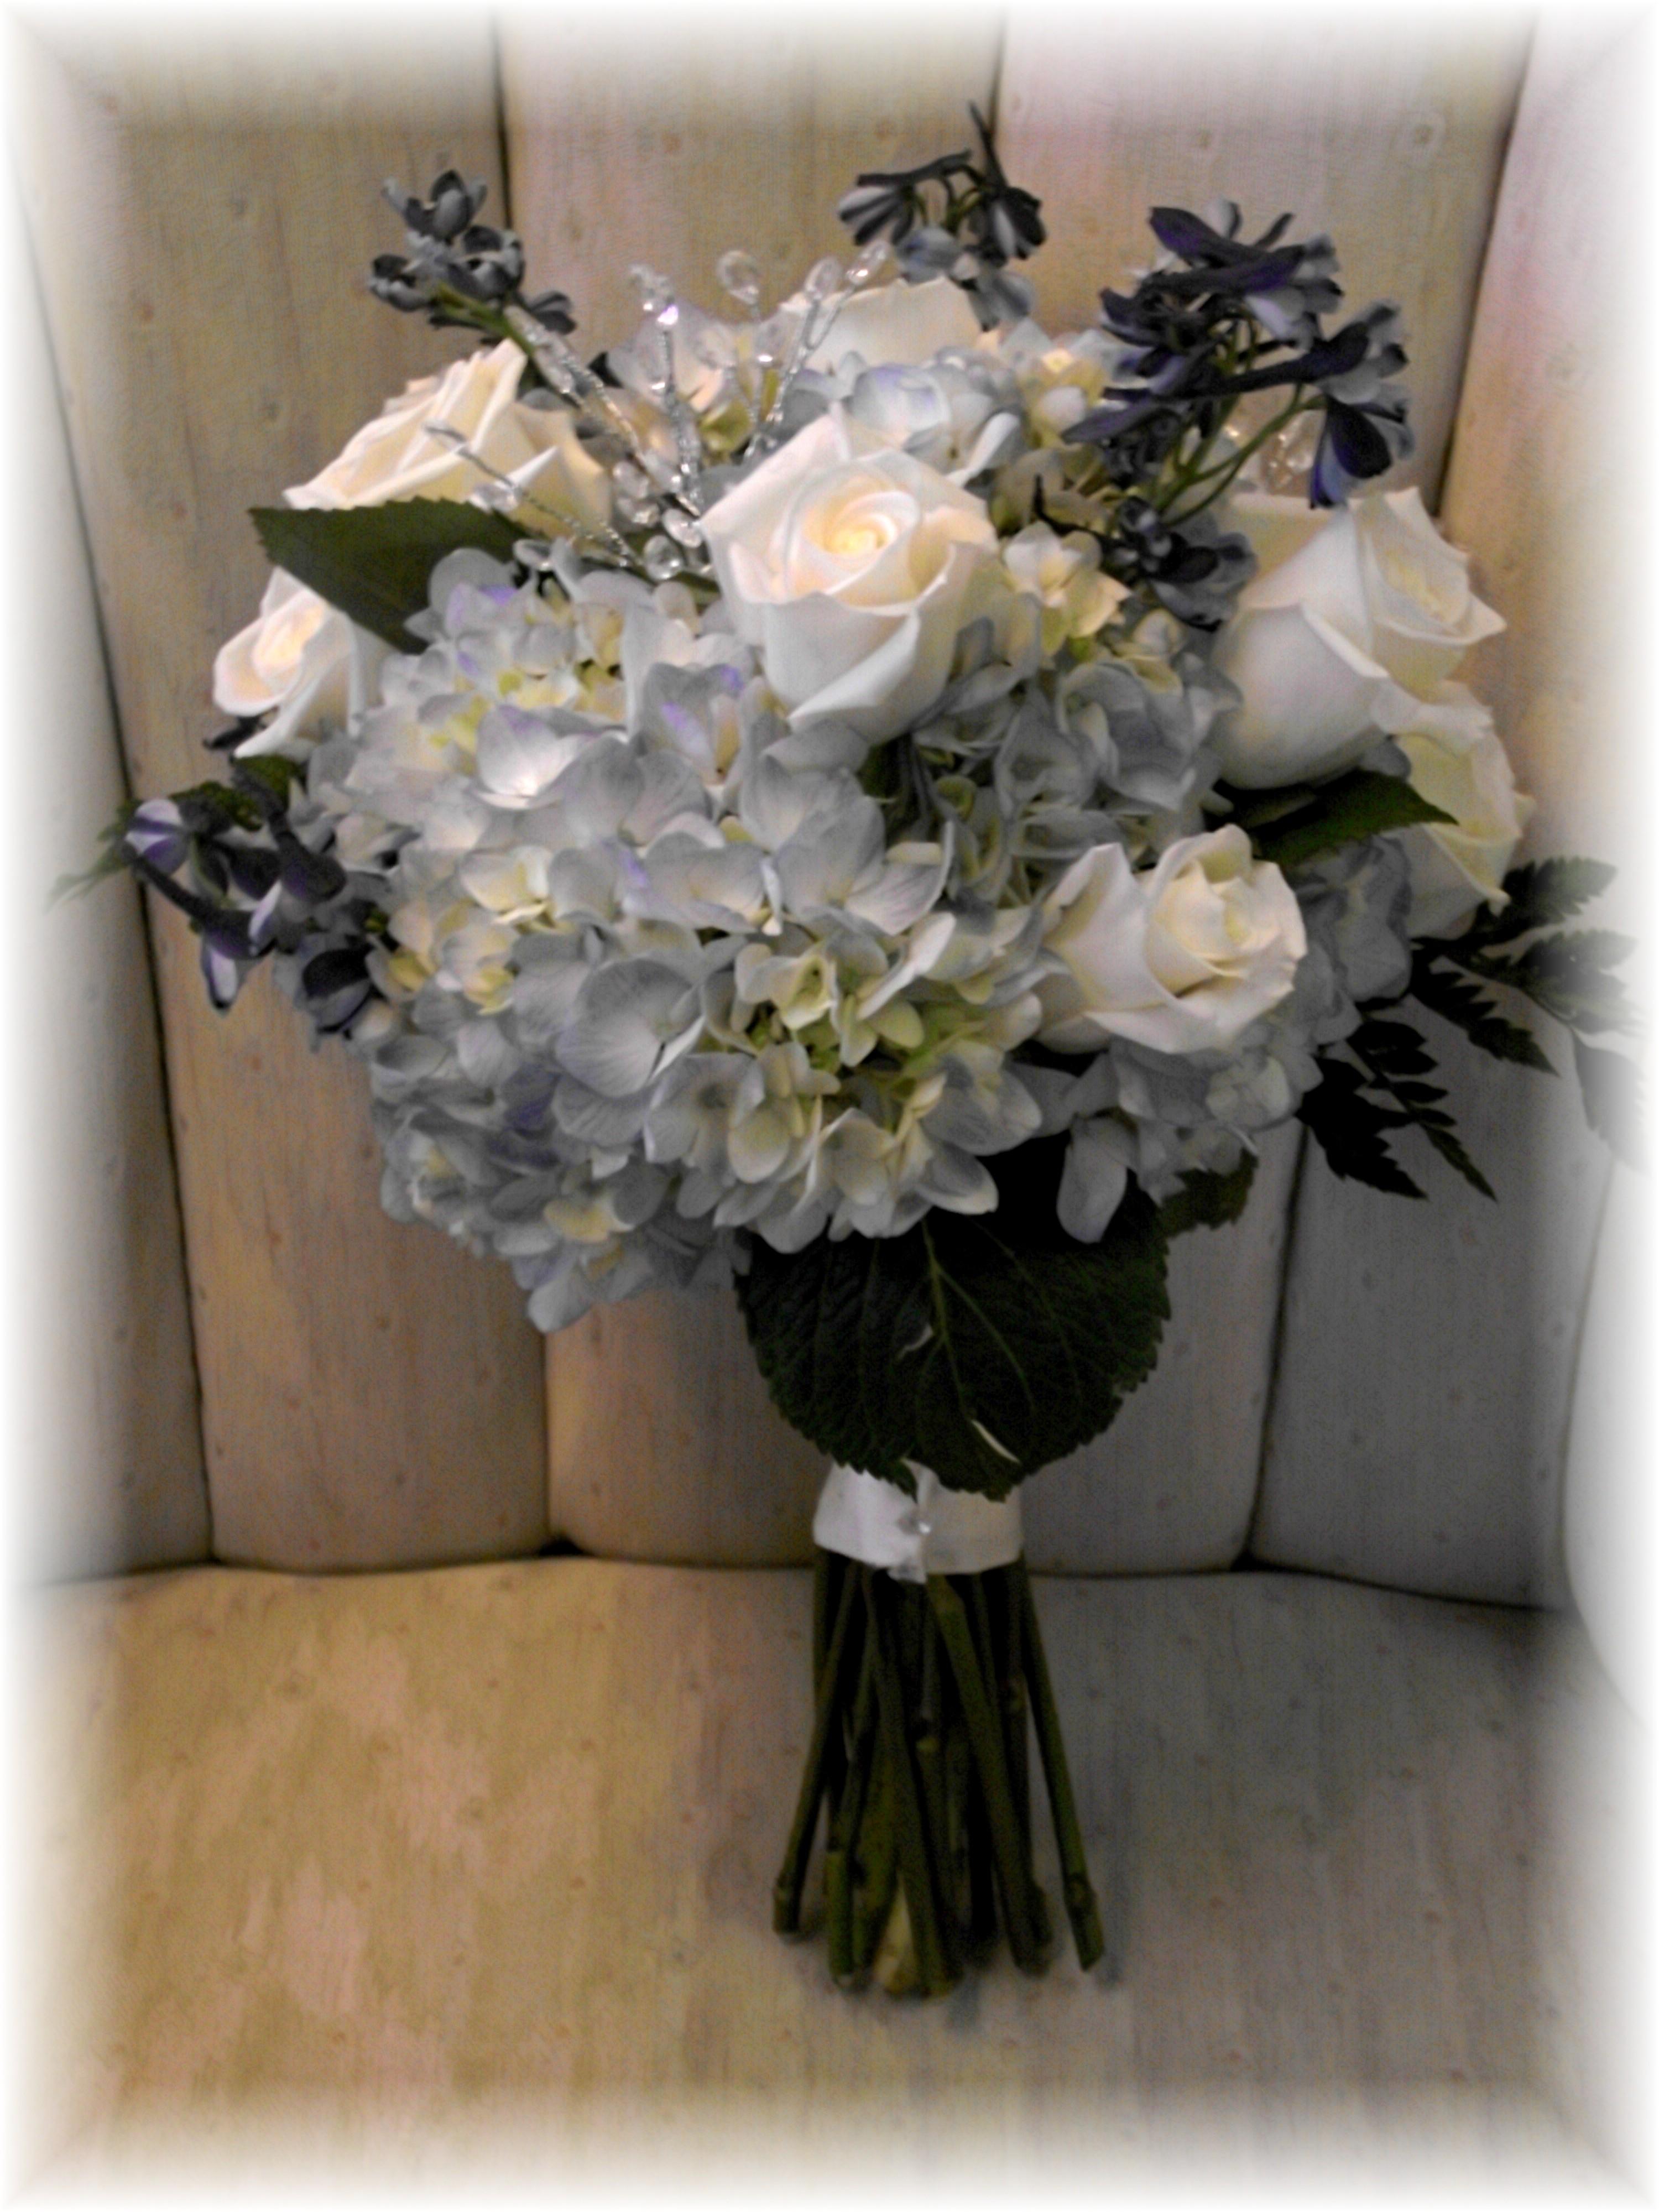 Hydrangea, Roses with Delphinium